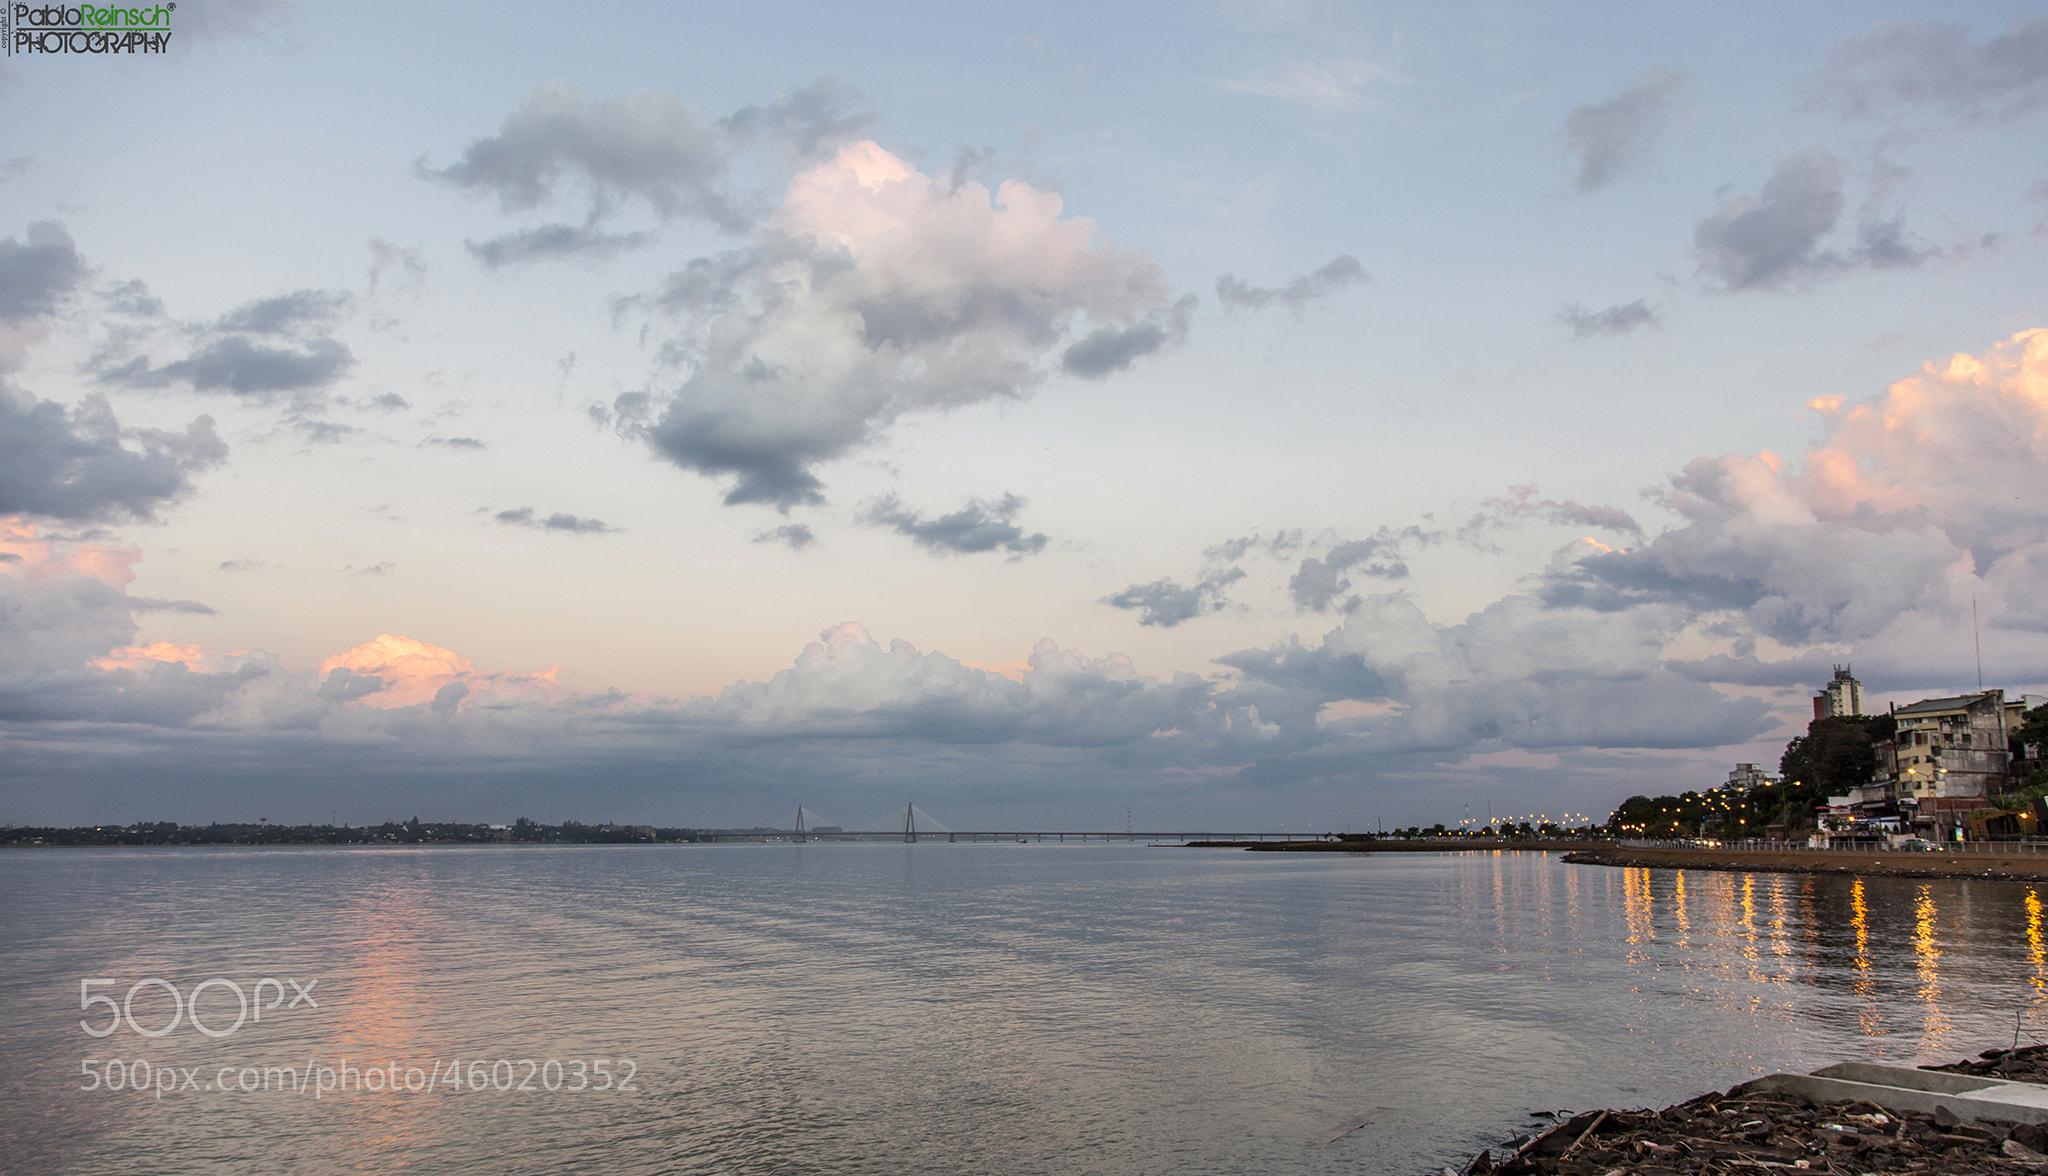 Photograph Calma sobre el río.- by Pablo Reinsch on 500px